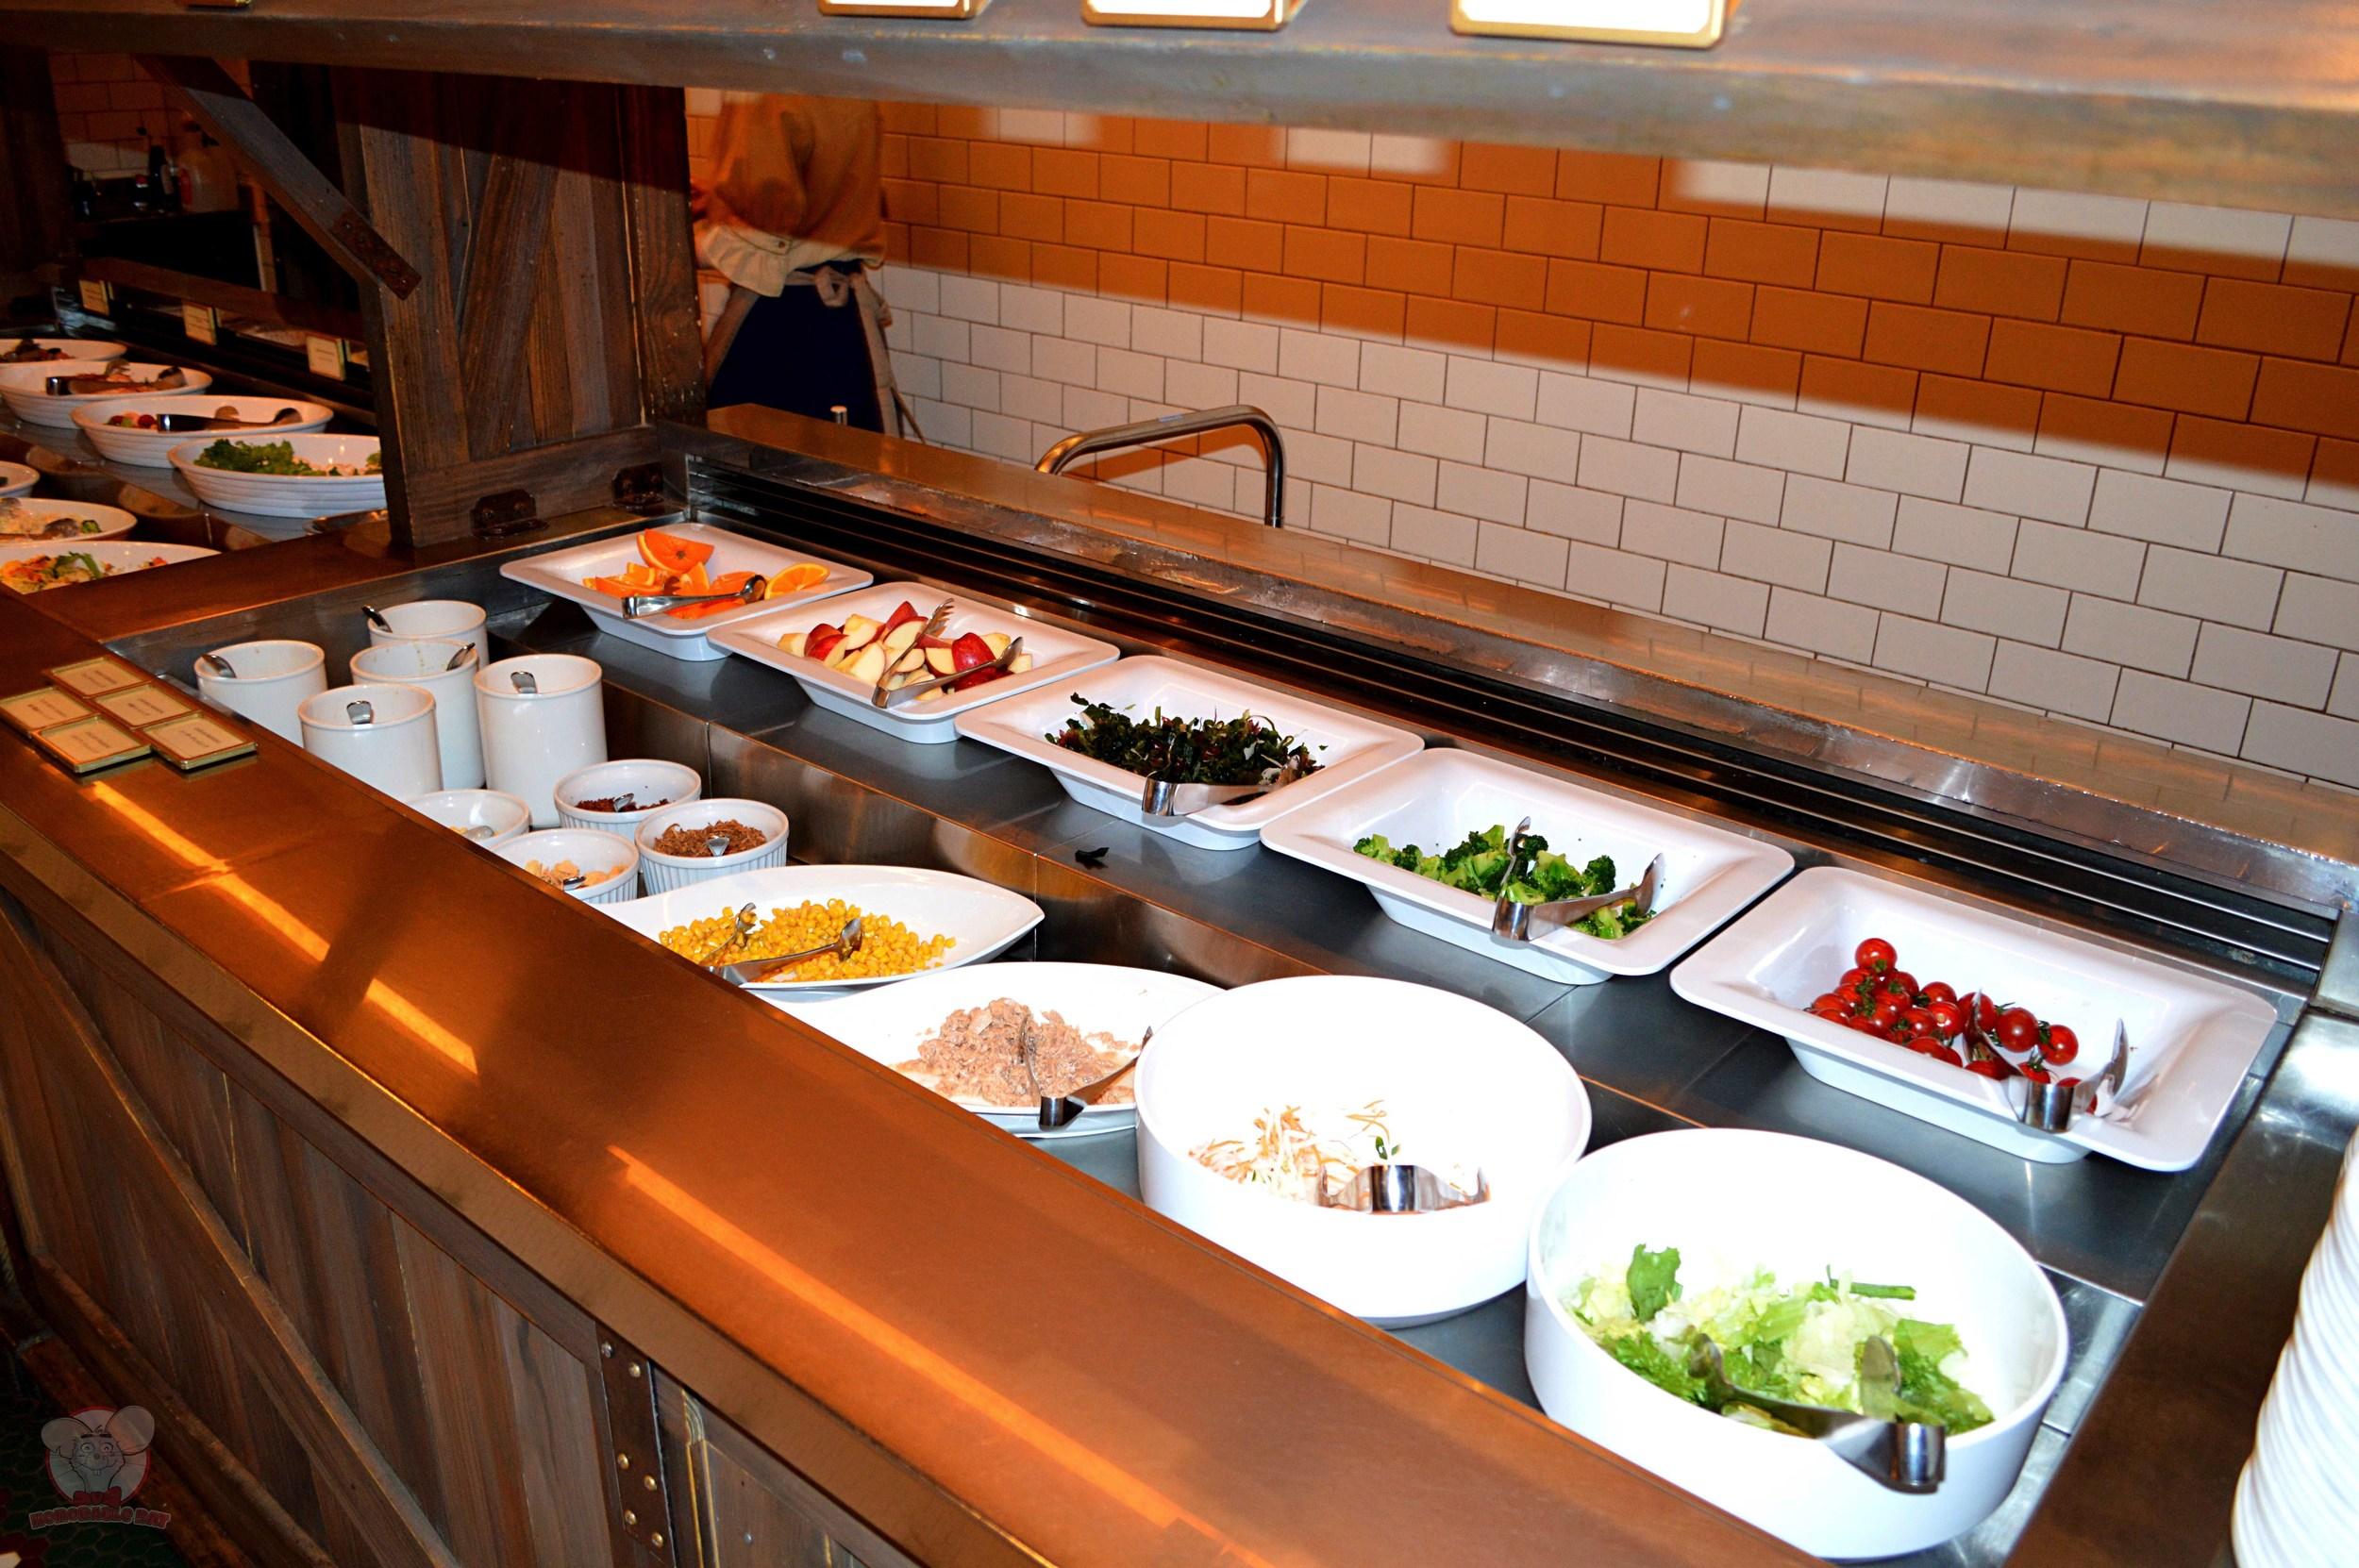 Soup & Salad selection (A)